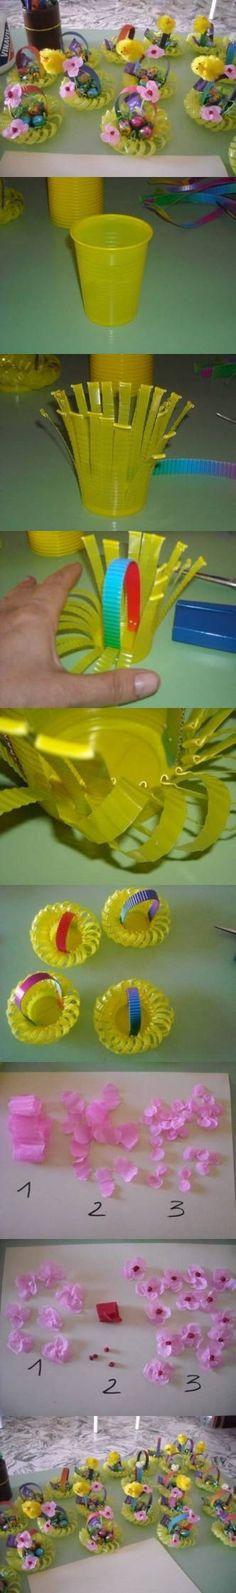 DIY Plastic Cup Flower Basket DIY Projects